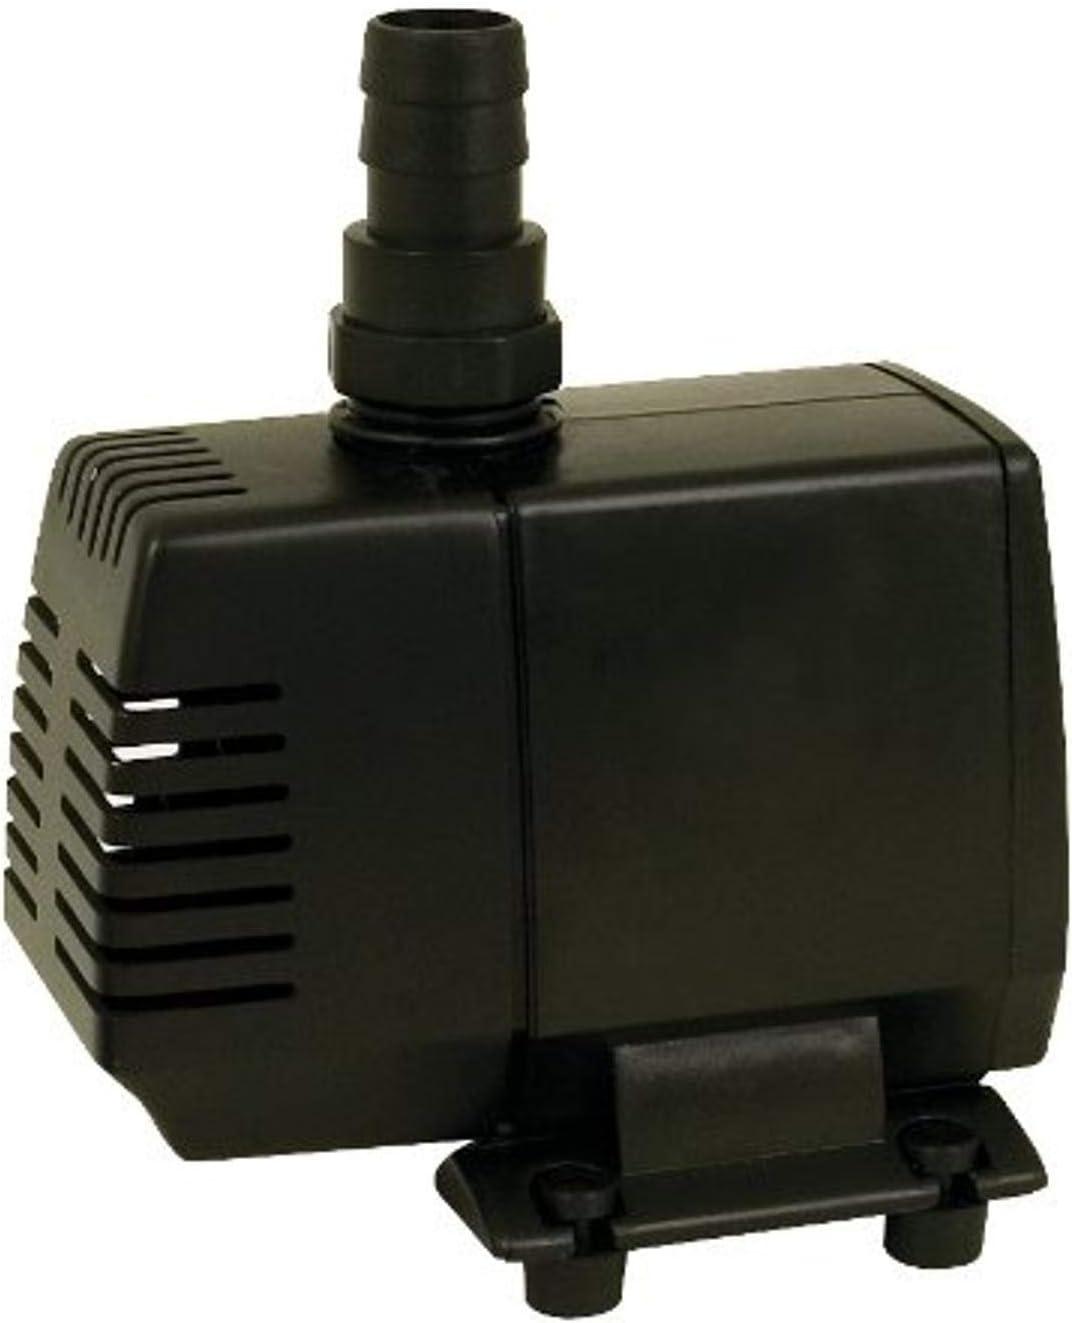 TetraPond Water Garden Pump 300 GPH List price Filte Cheap bargain Small Waterfalls For